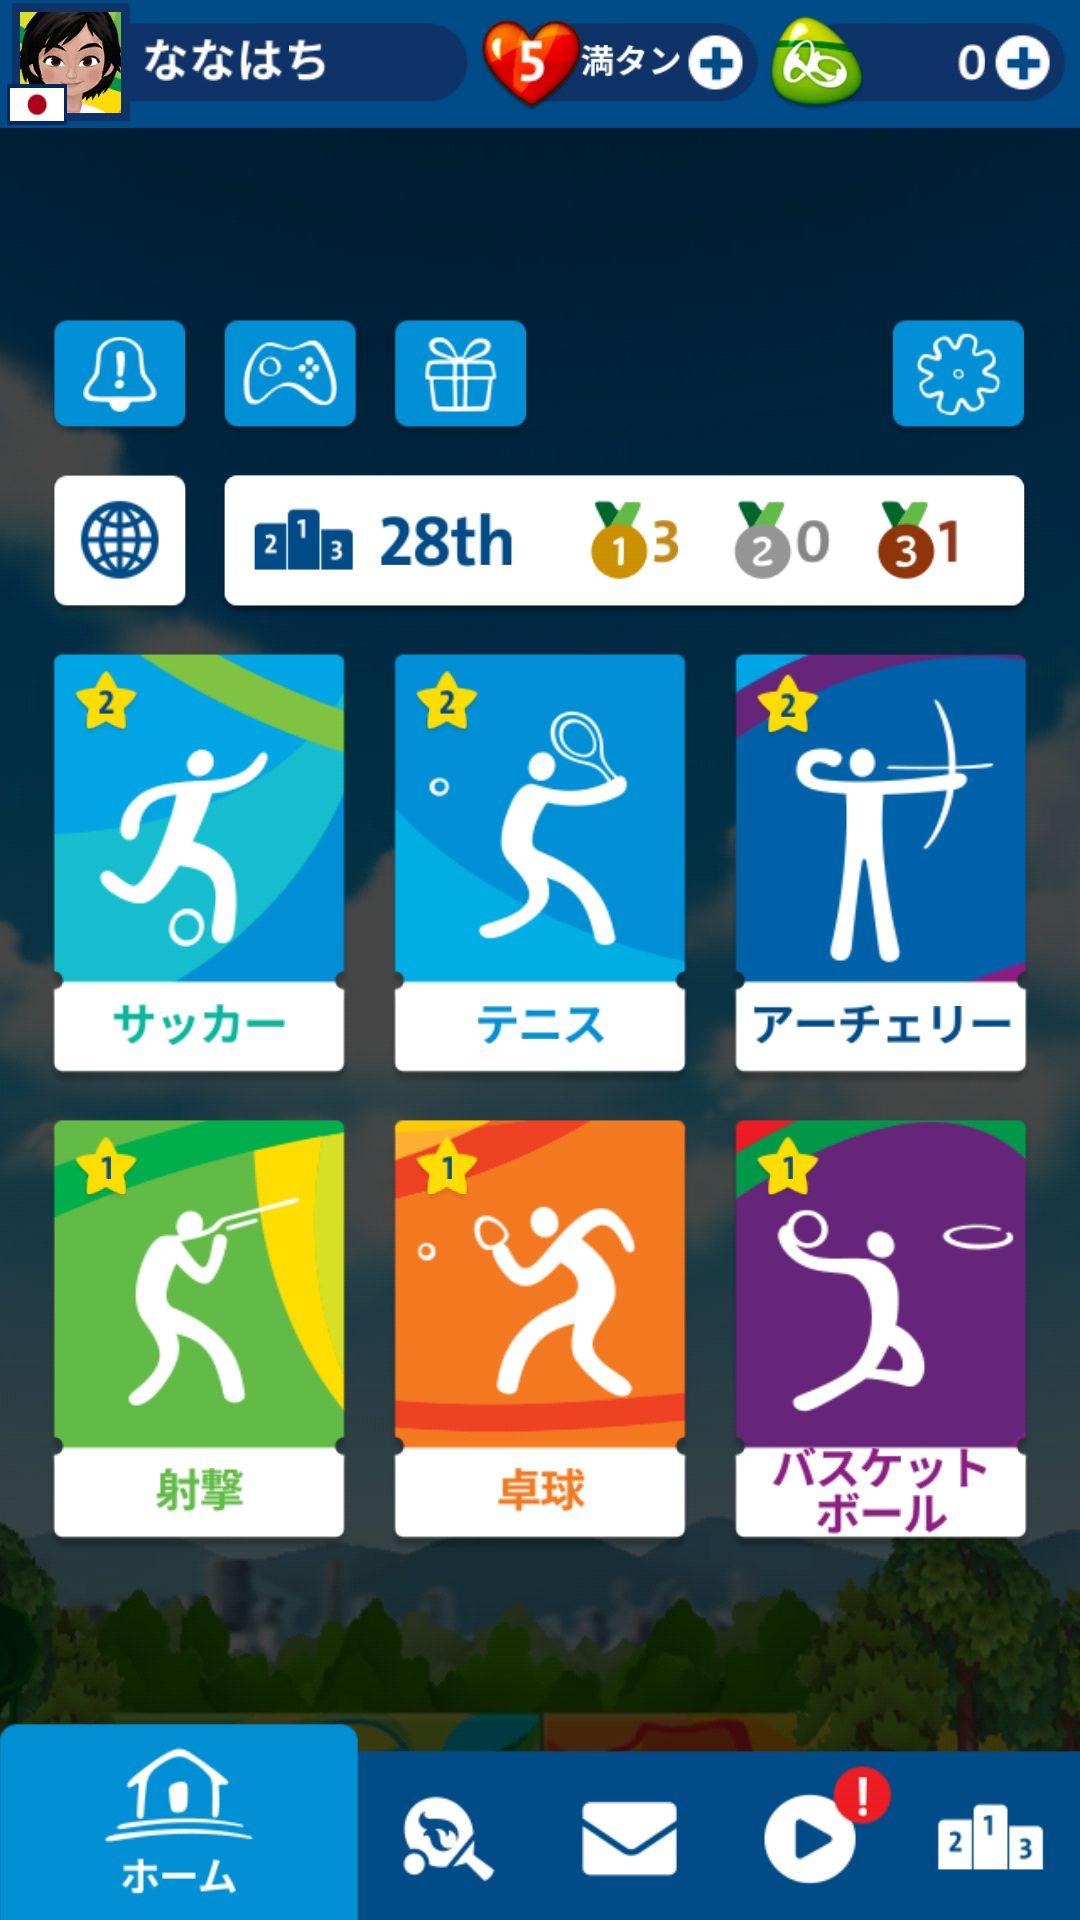 androidアプリ リオ2016オリンピック ゲームズ攻略スクリーンショット1